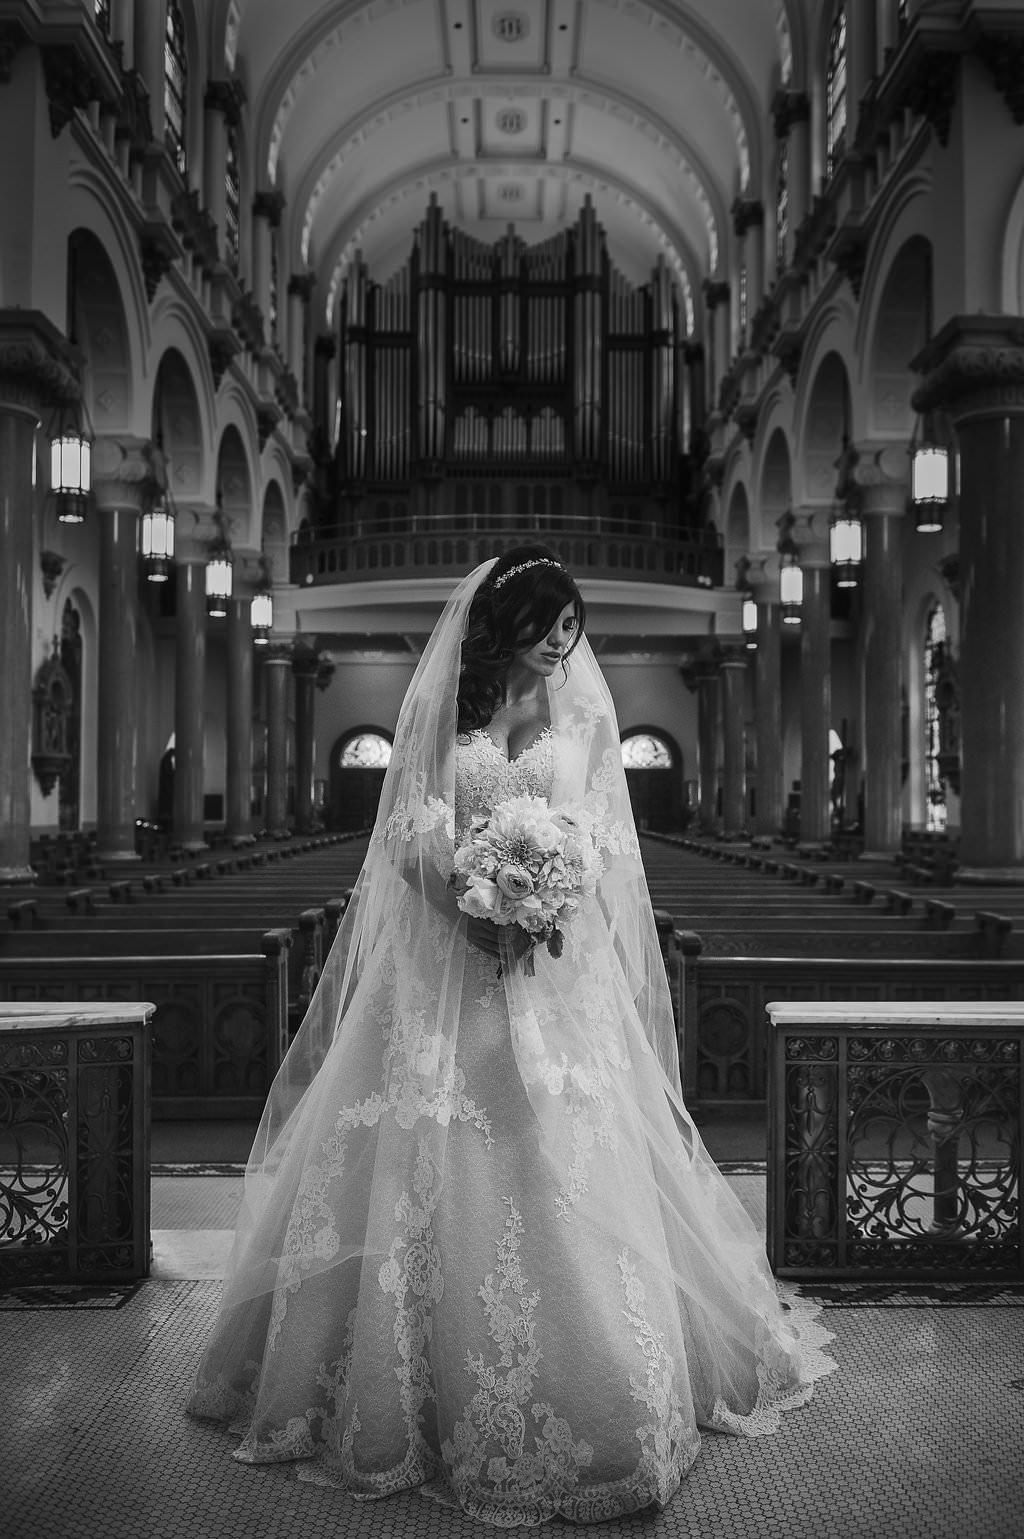 Wedding Ceremony Bridal Portrait at Downtown Tampa Traditional Wedding Ceremony Venue Sacred Heart Catholic Church | Tampa Bay Photographer Marc Edwards Photographs